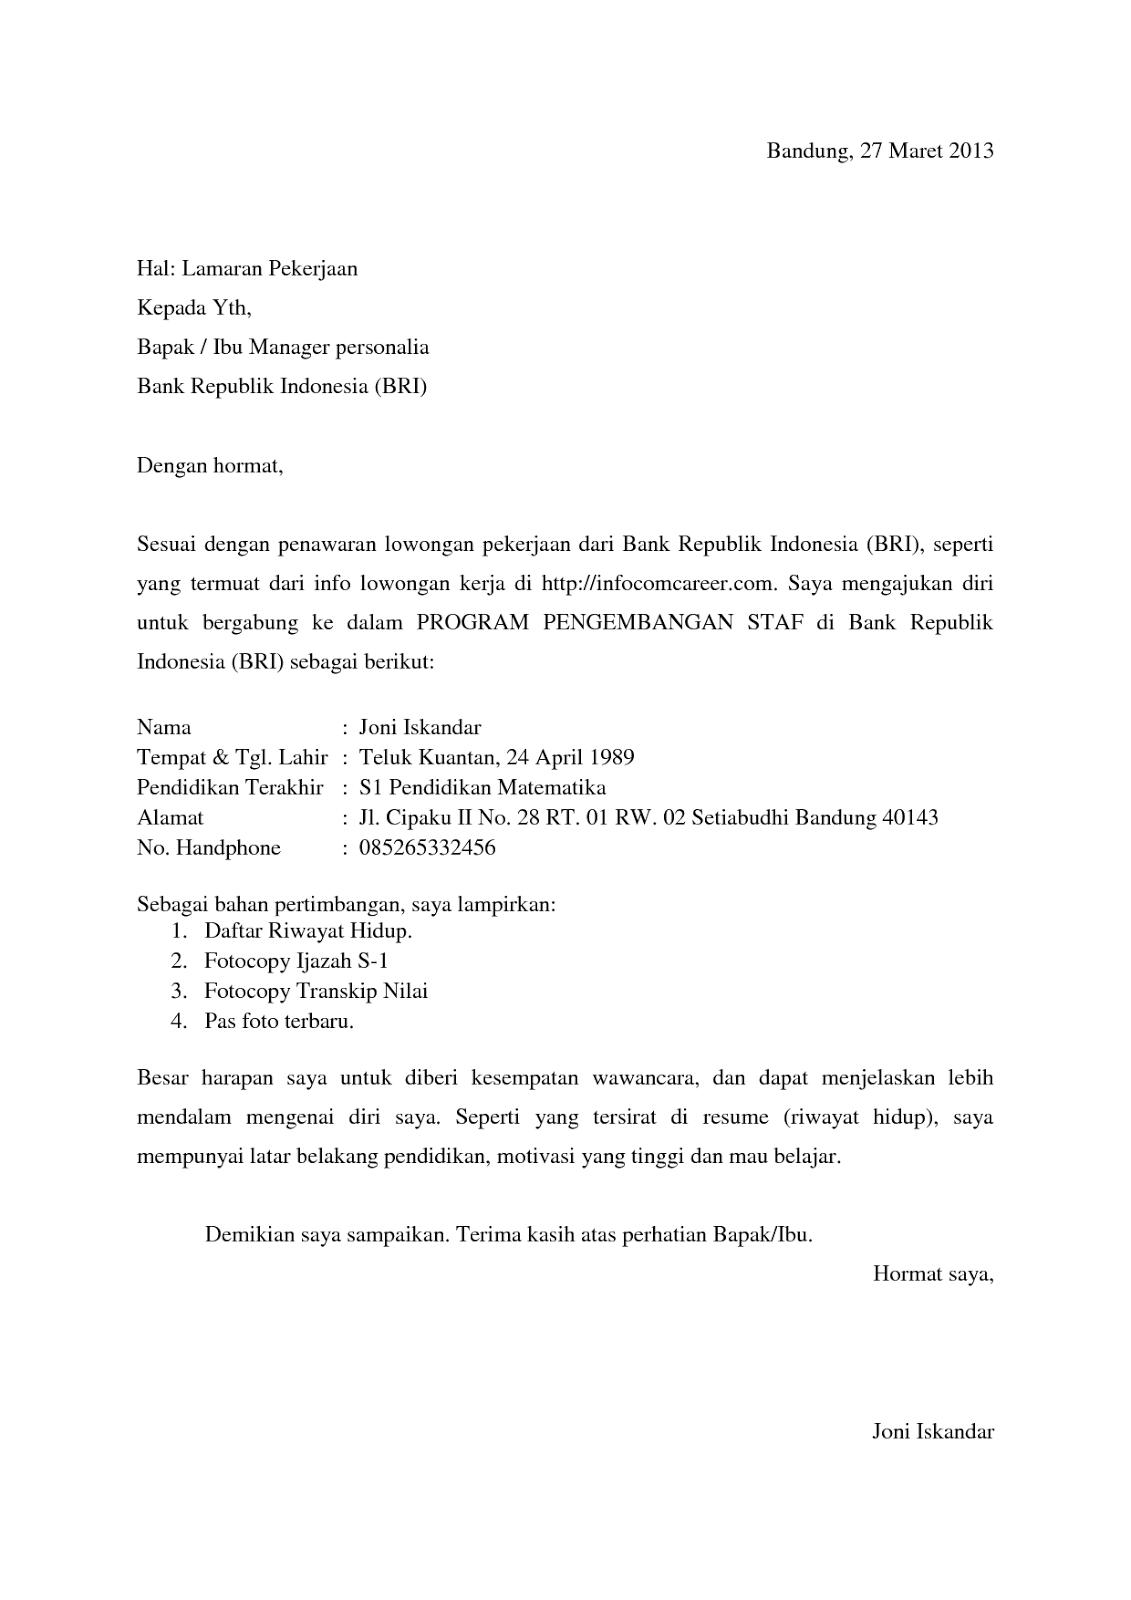 Surat Lamaran Starbucks Indonesia